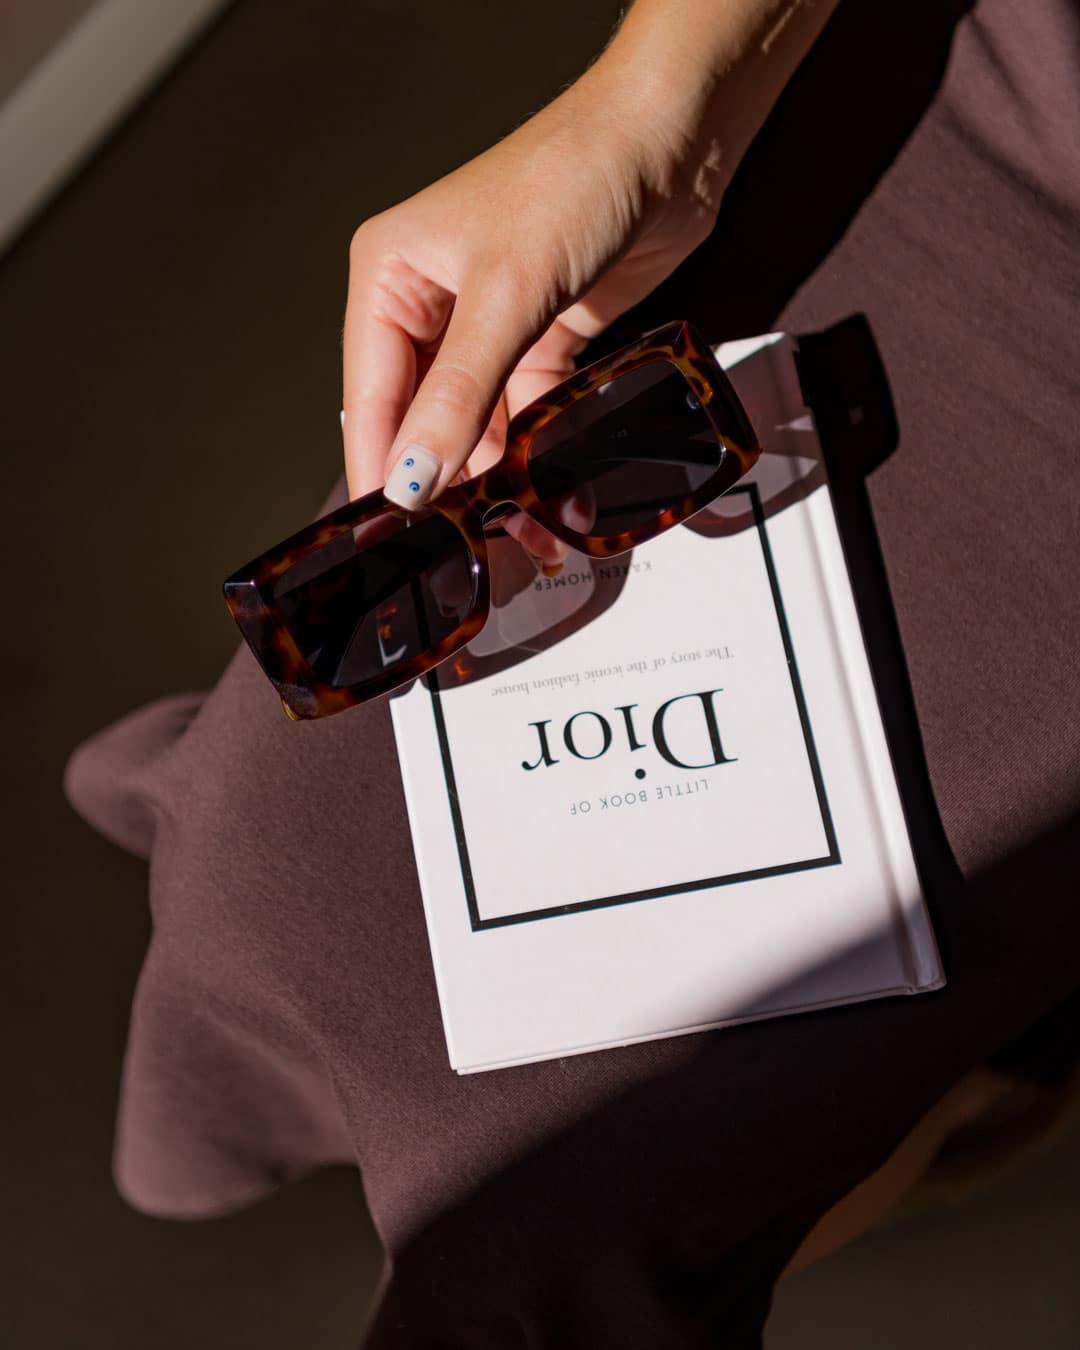 rectangle tortoise shell sunglasses on a book